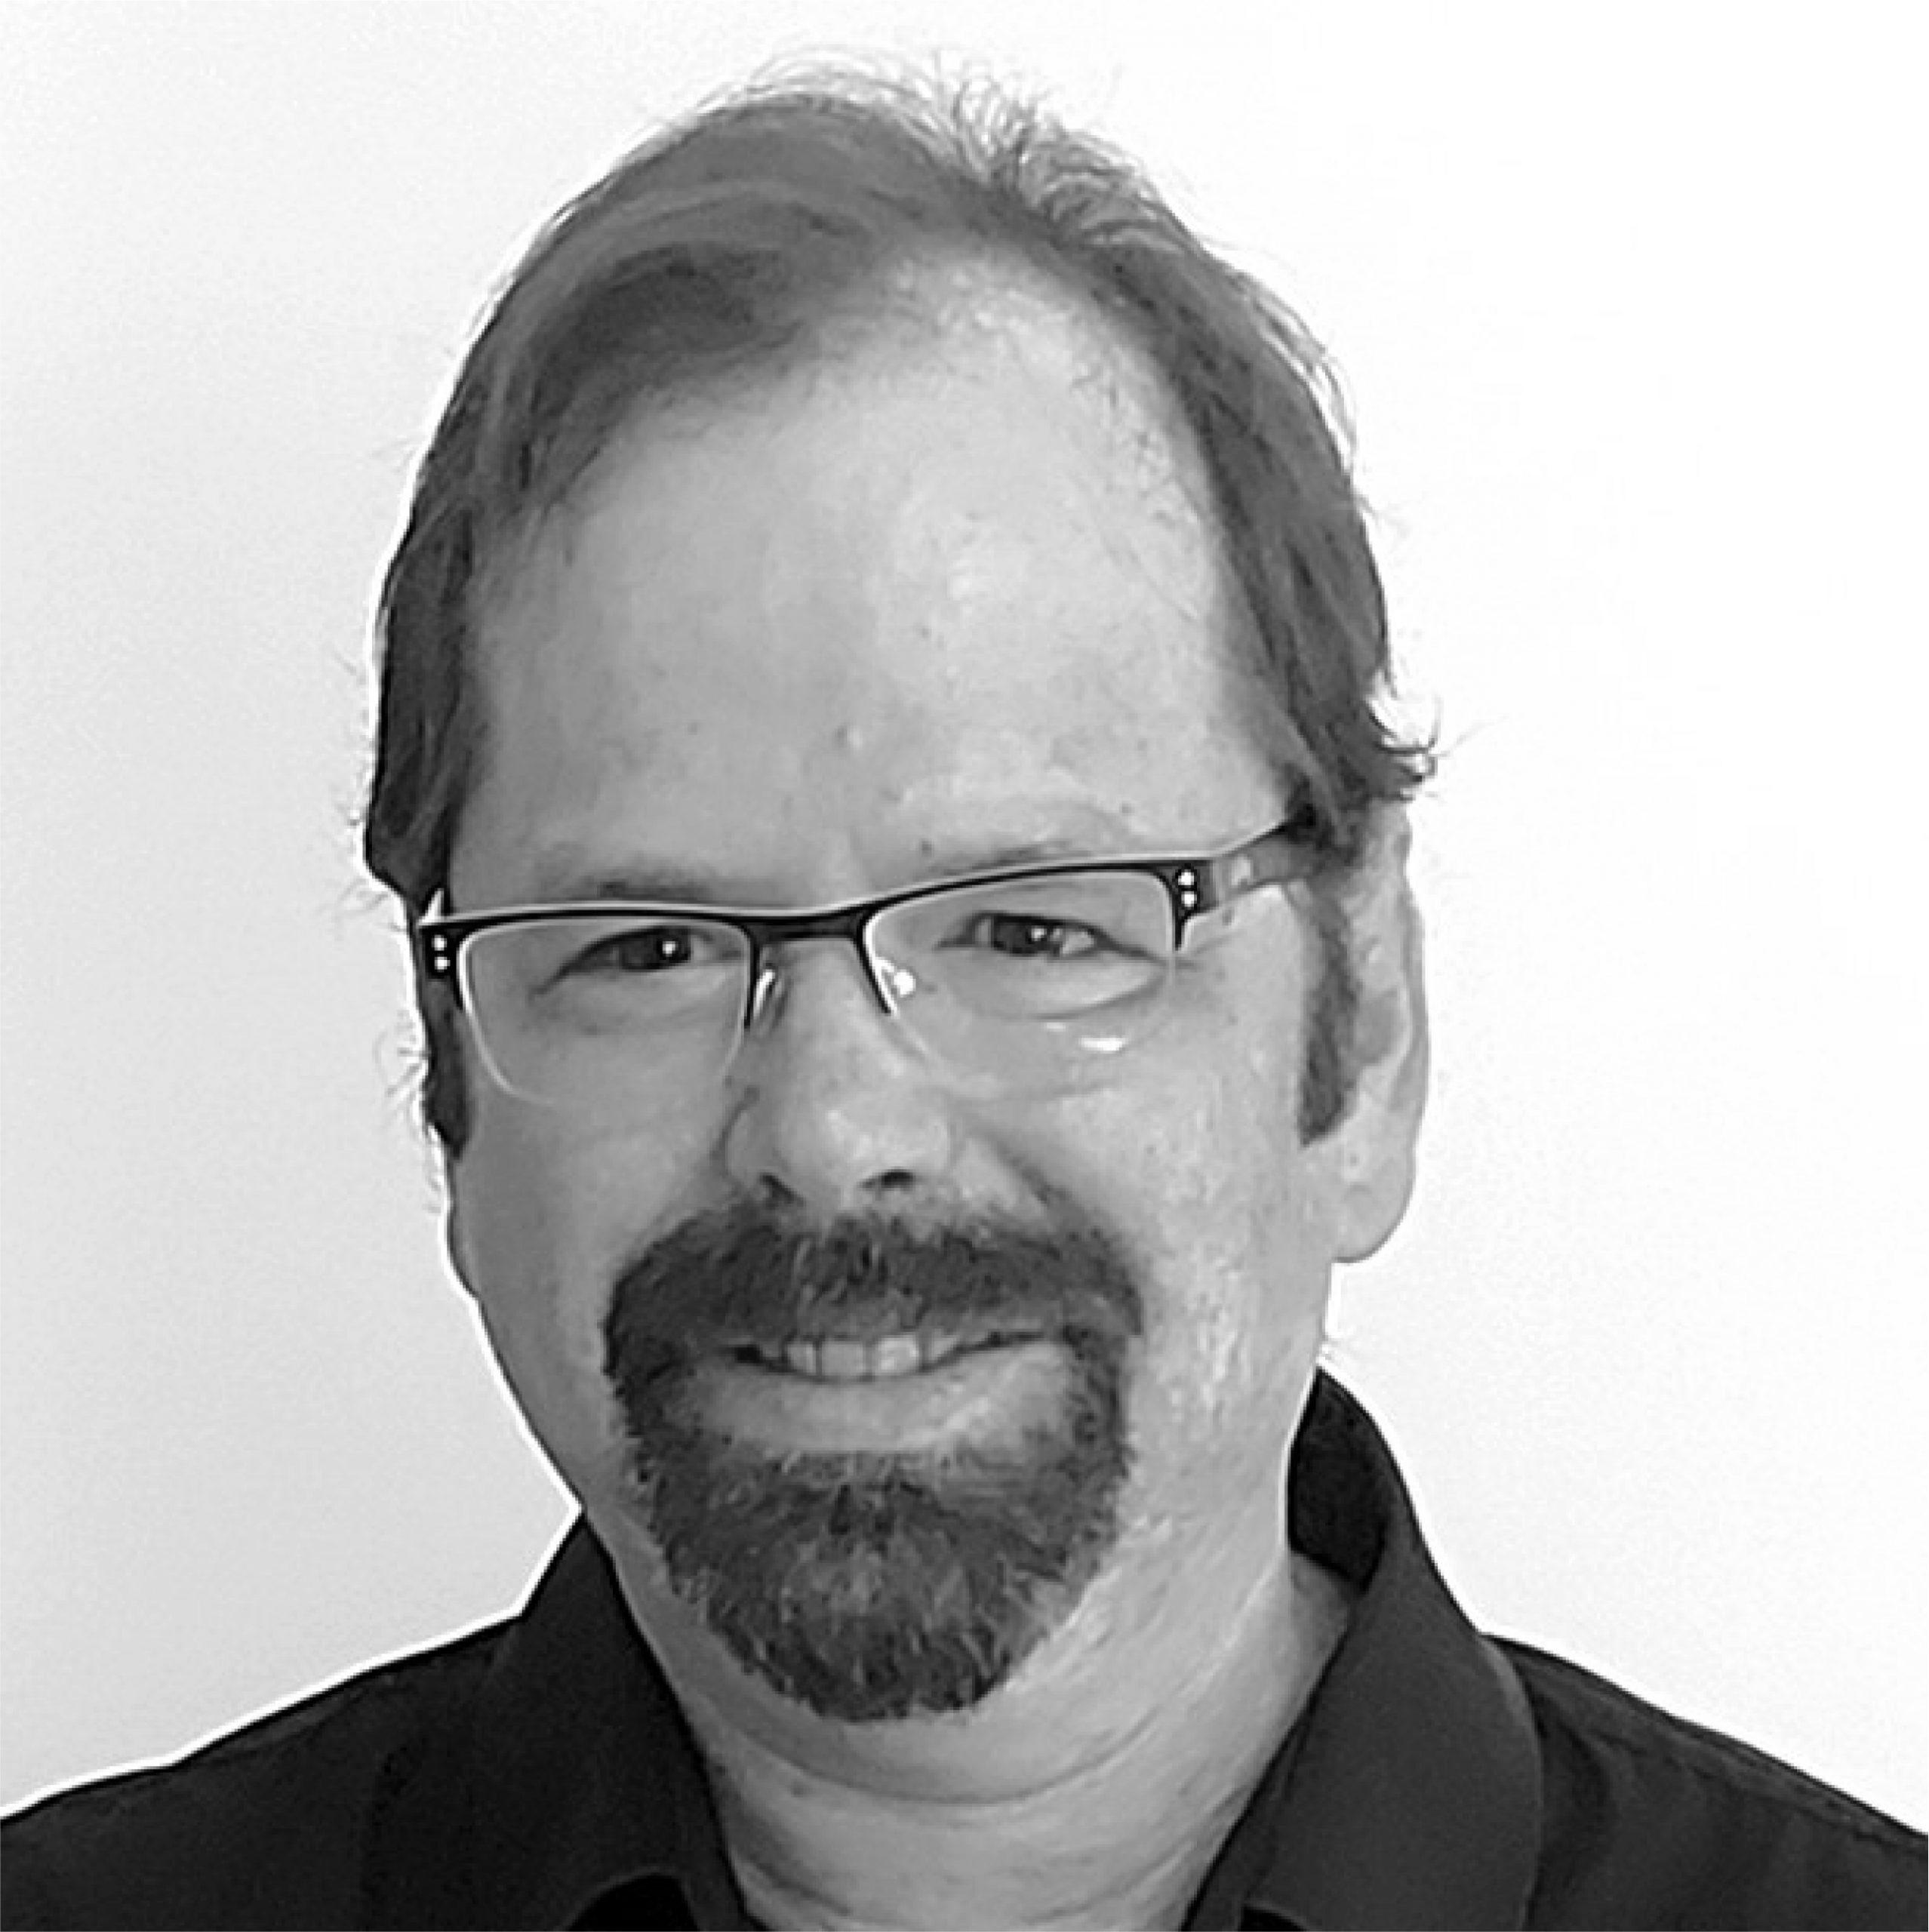 David Stinman